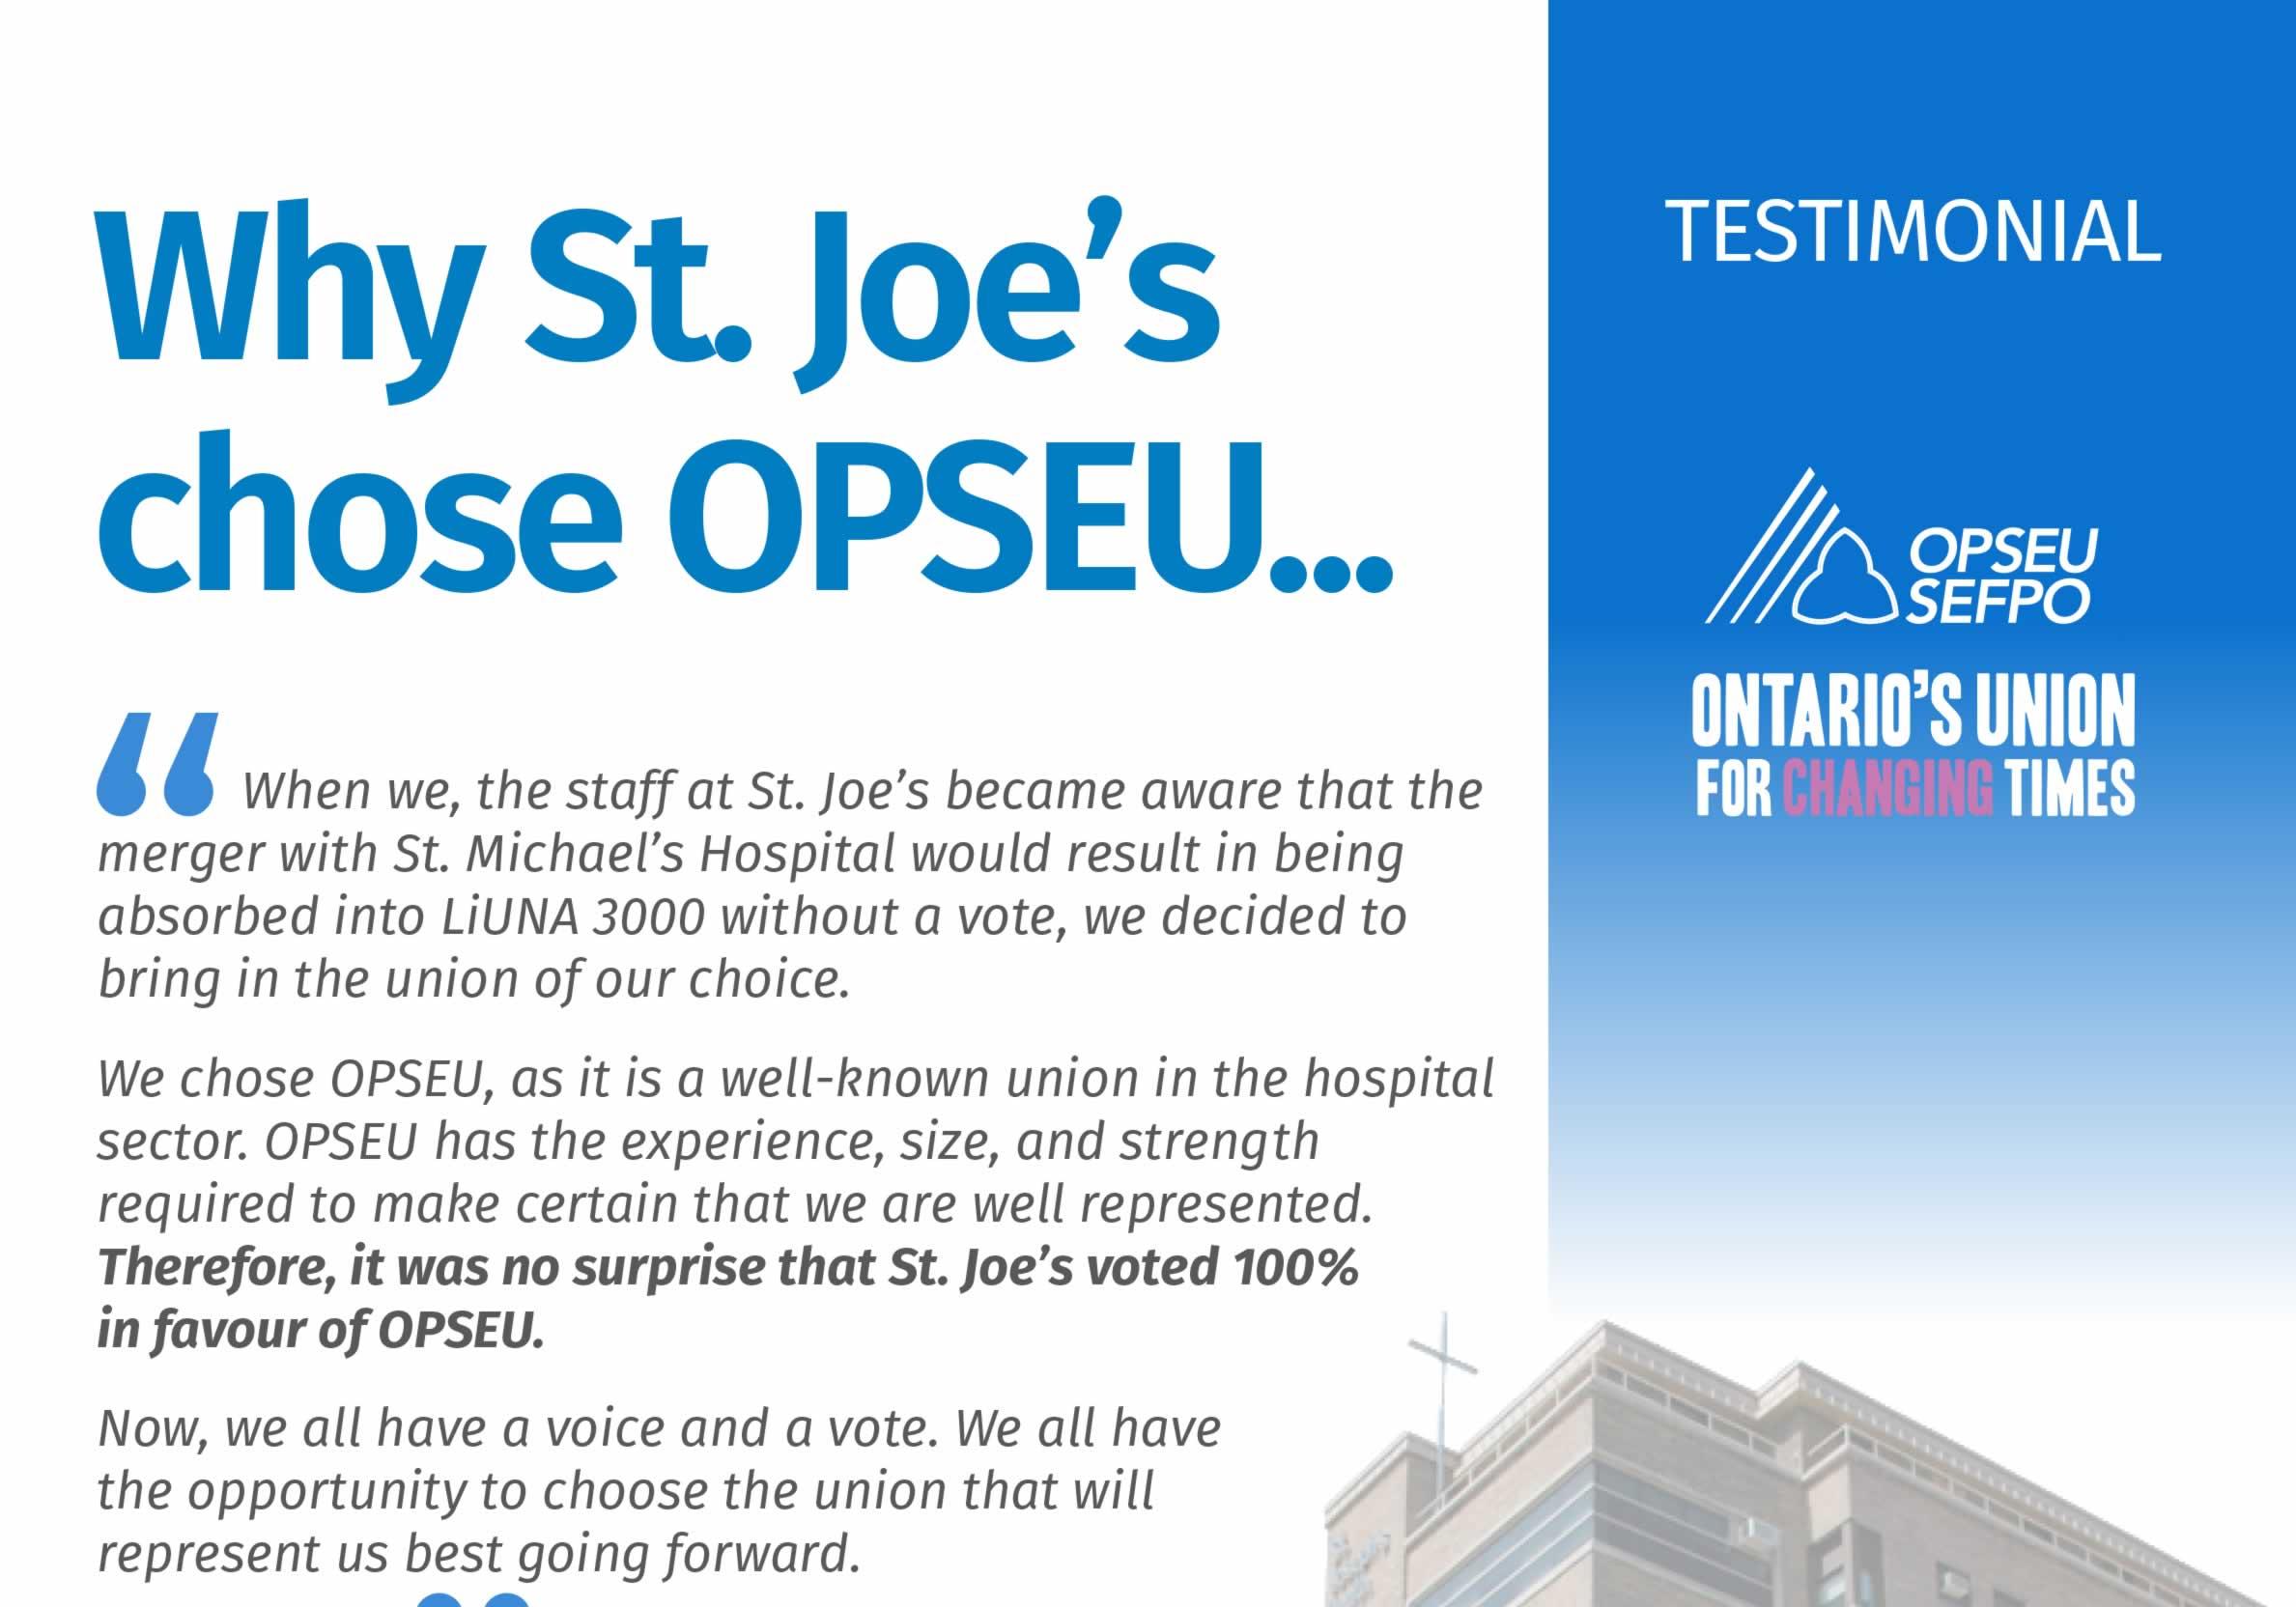 Why St. Joe's chose OPSEU testimonial